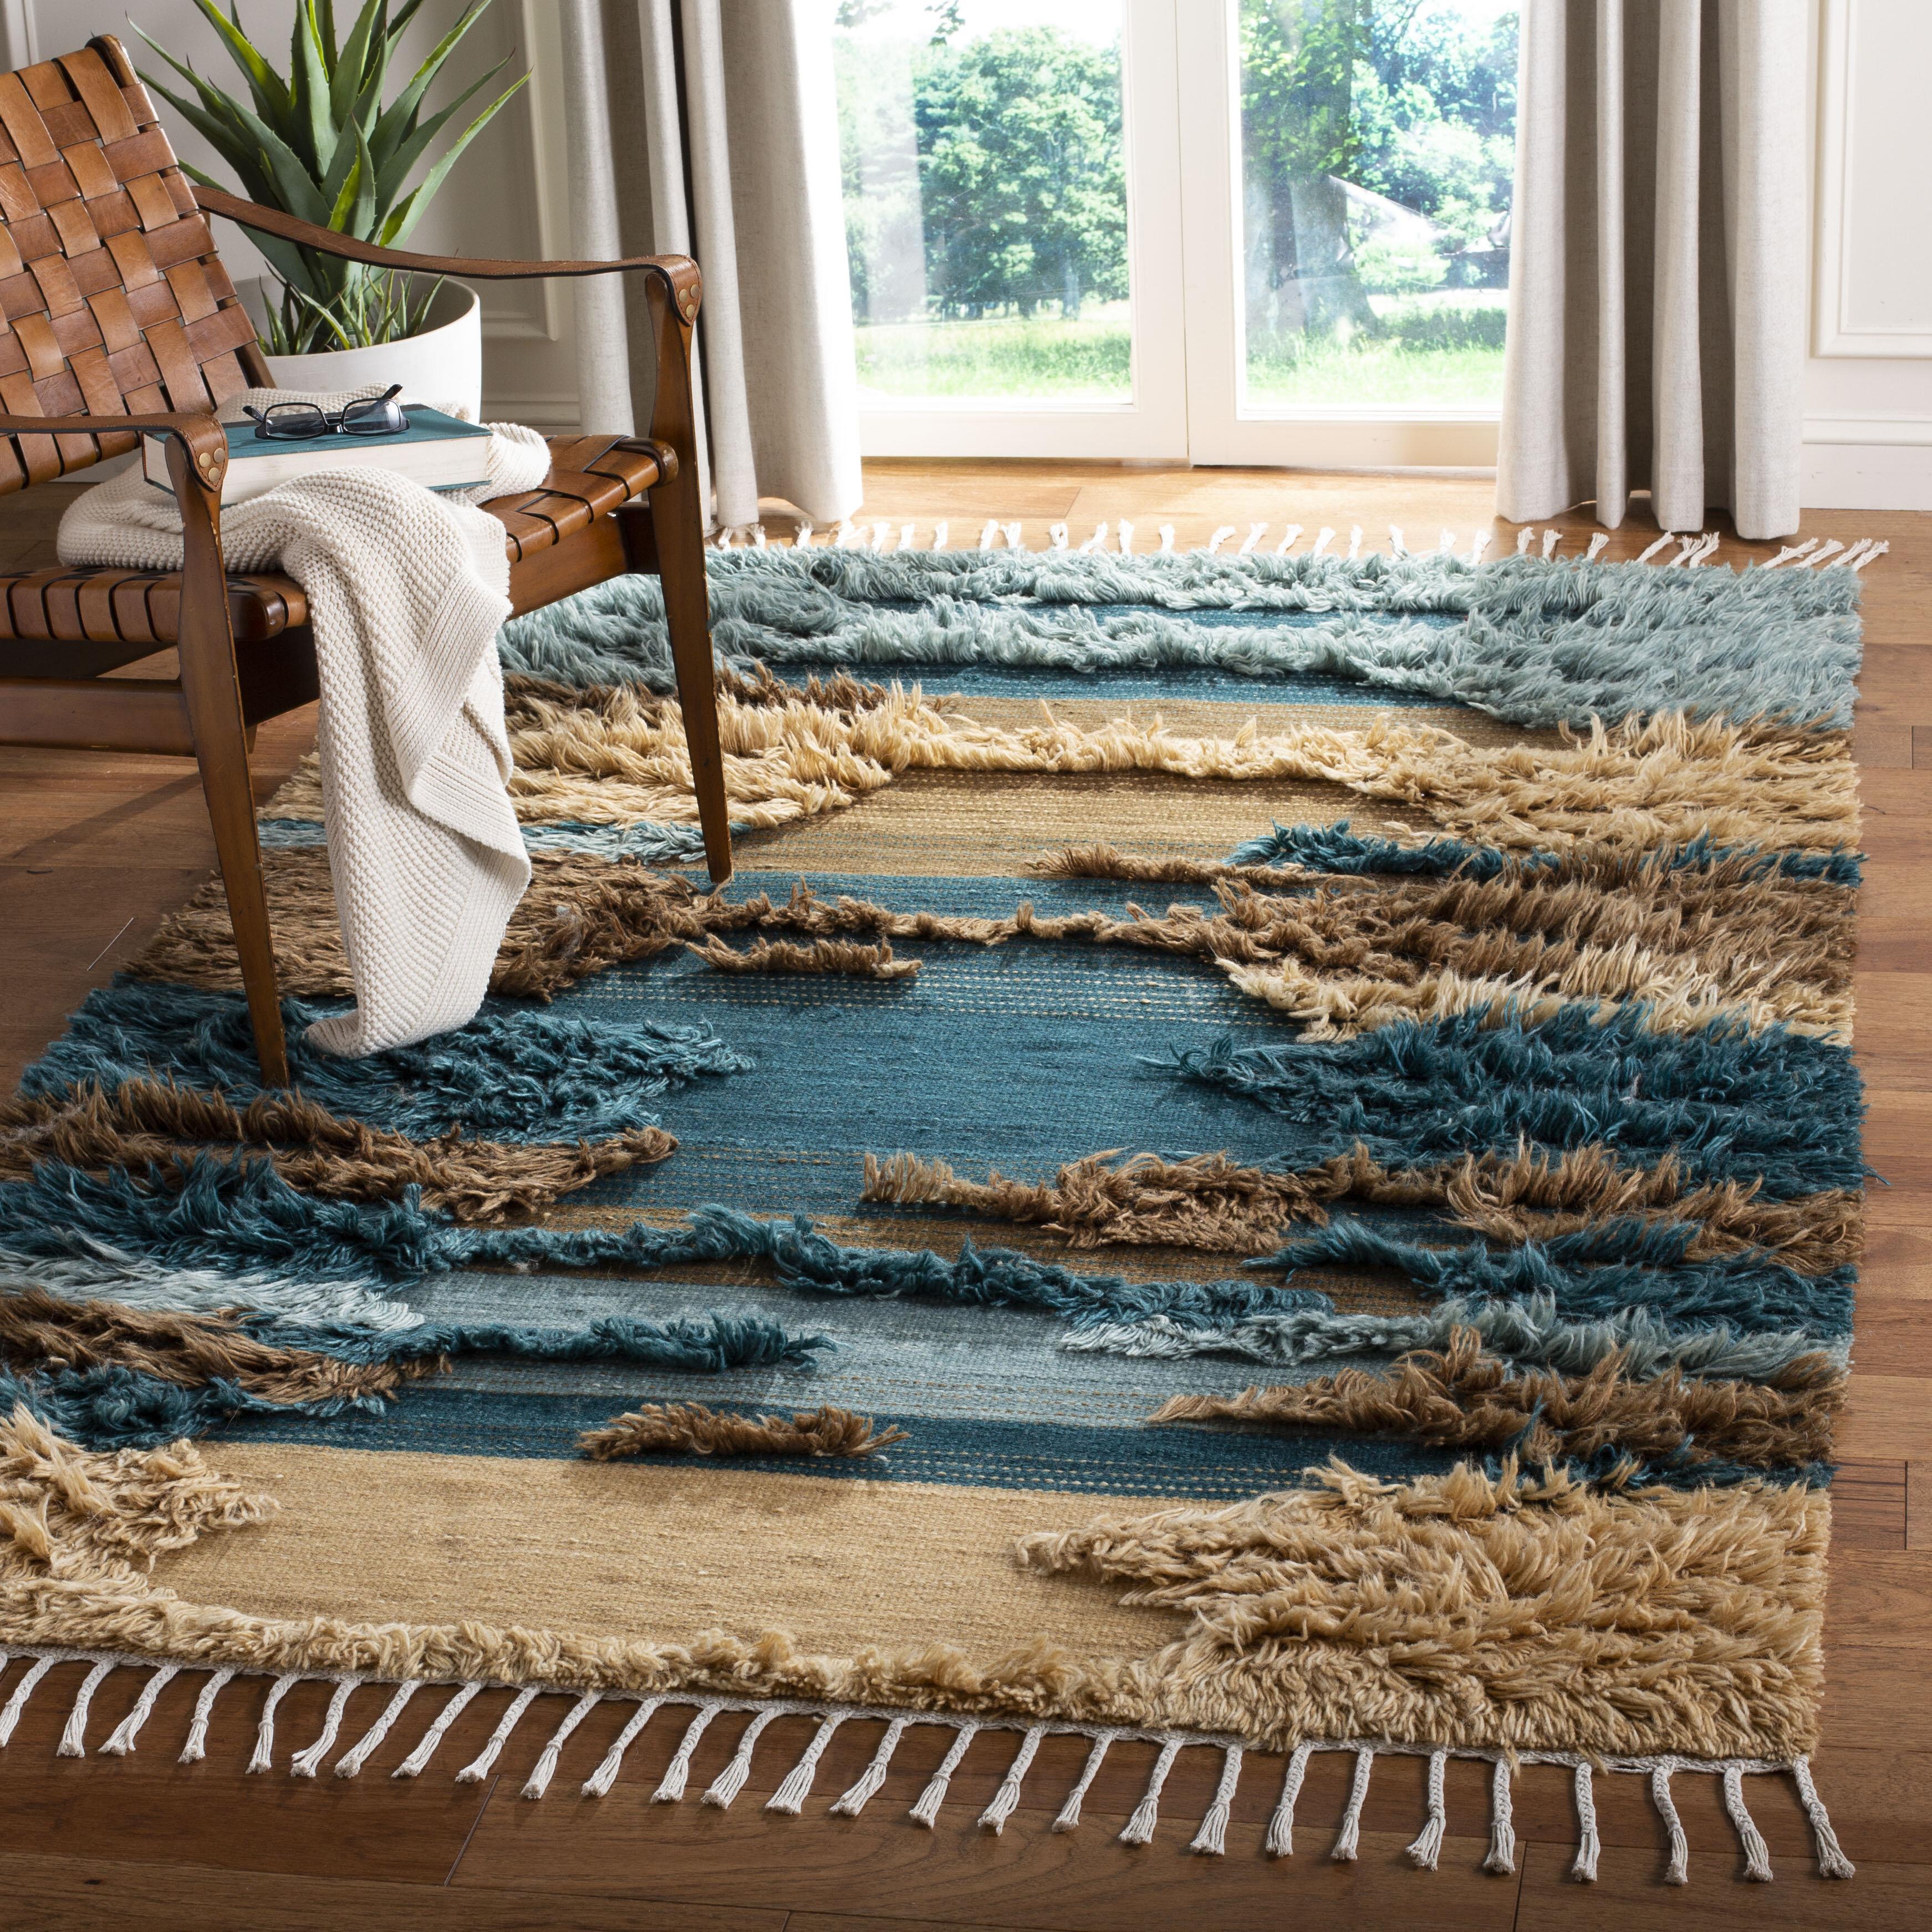 Union Rustic Parinaaz Hand Knotted Wool Cotton Blue Beige Brown Area Rug Wayfair